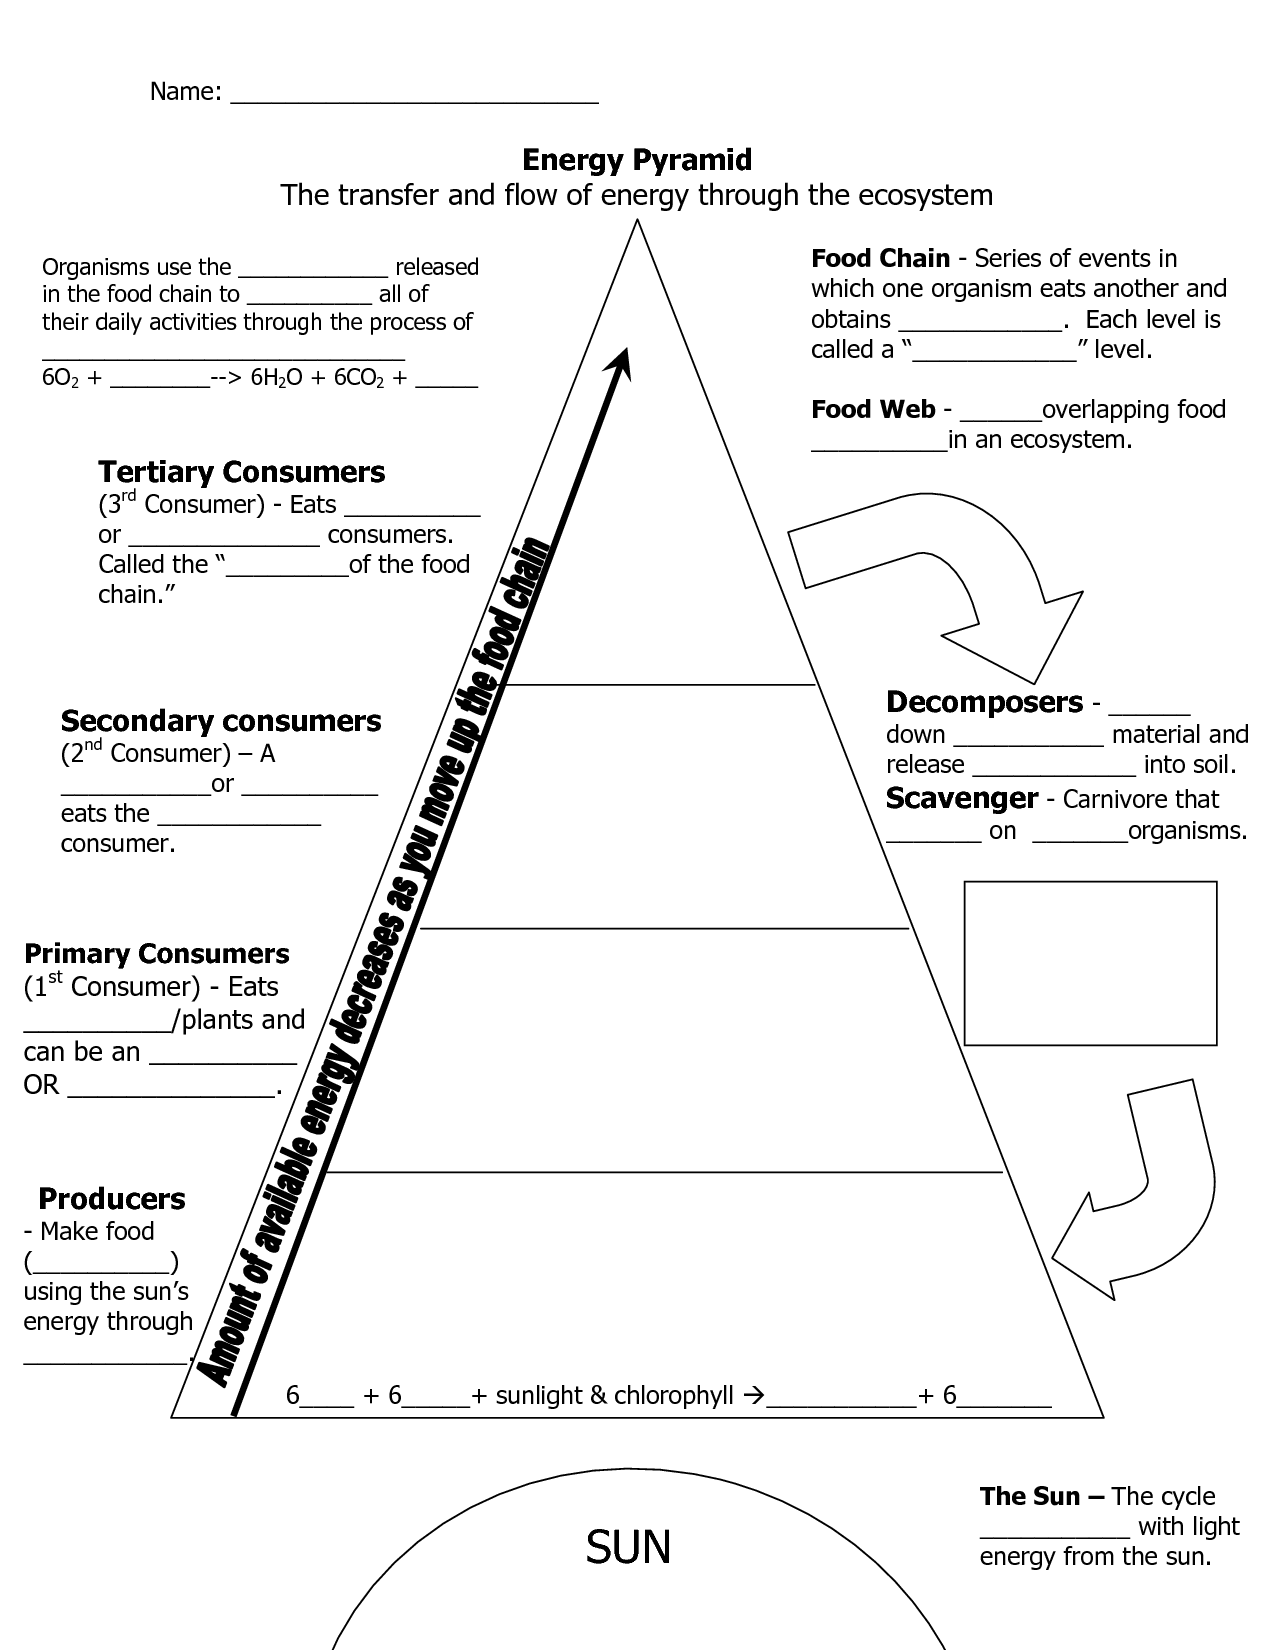 Ecological Pyramid Worksheet Energy Pyramid Worksheets Middle School -  1275x1650 - png   Biology worksheet [ 1650 x 1275 Pixel ]